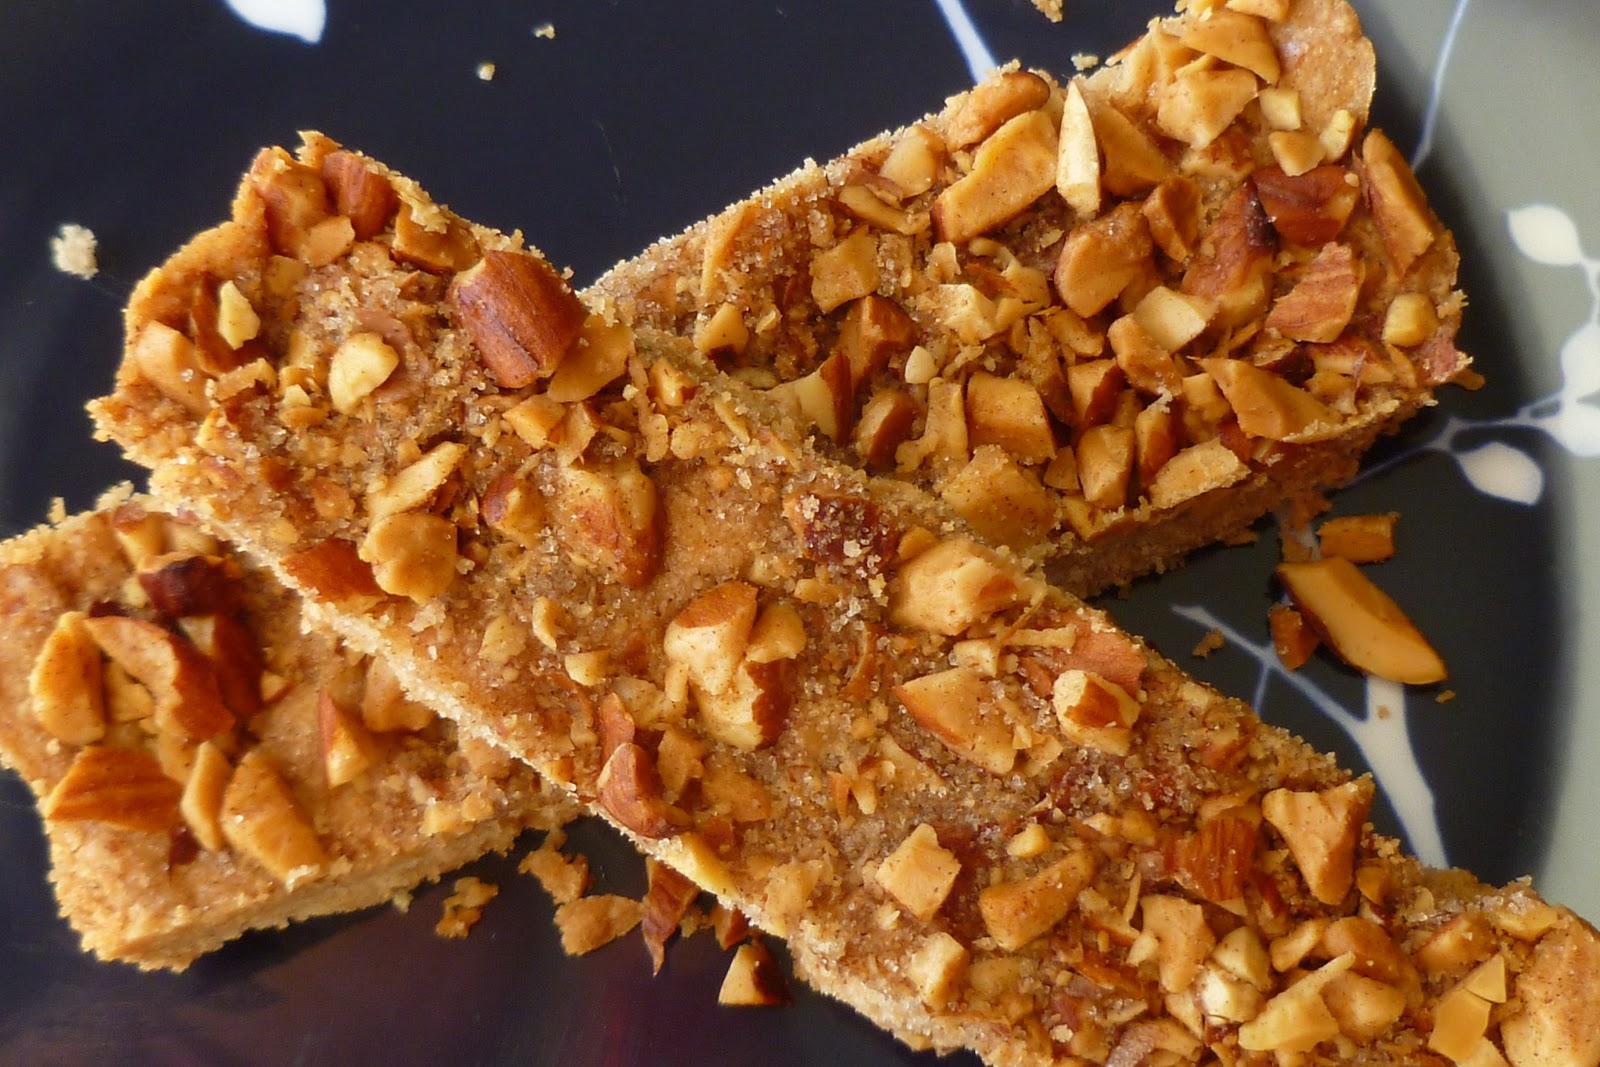 ... butter toffee crunch shortbread is still my favorite shortbread recipe